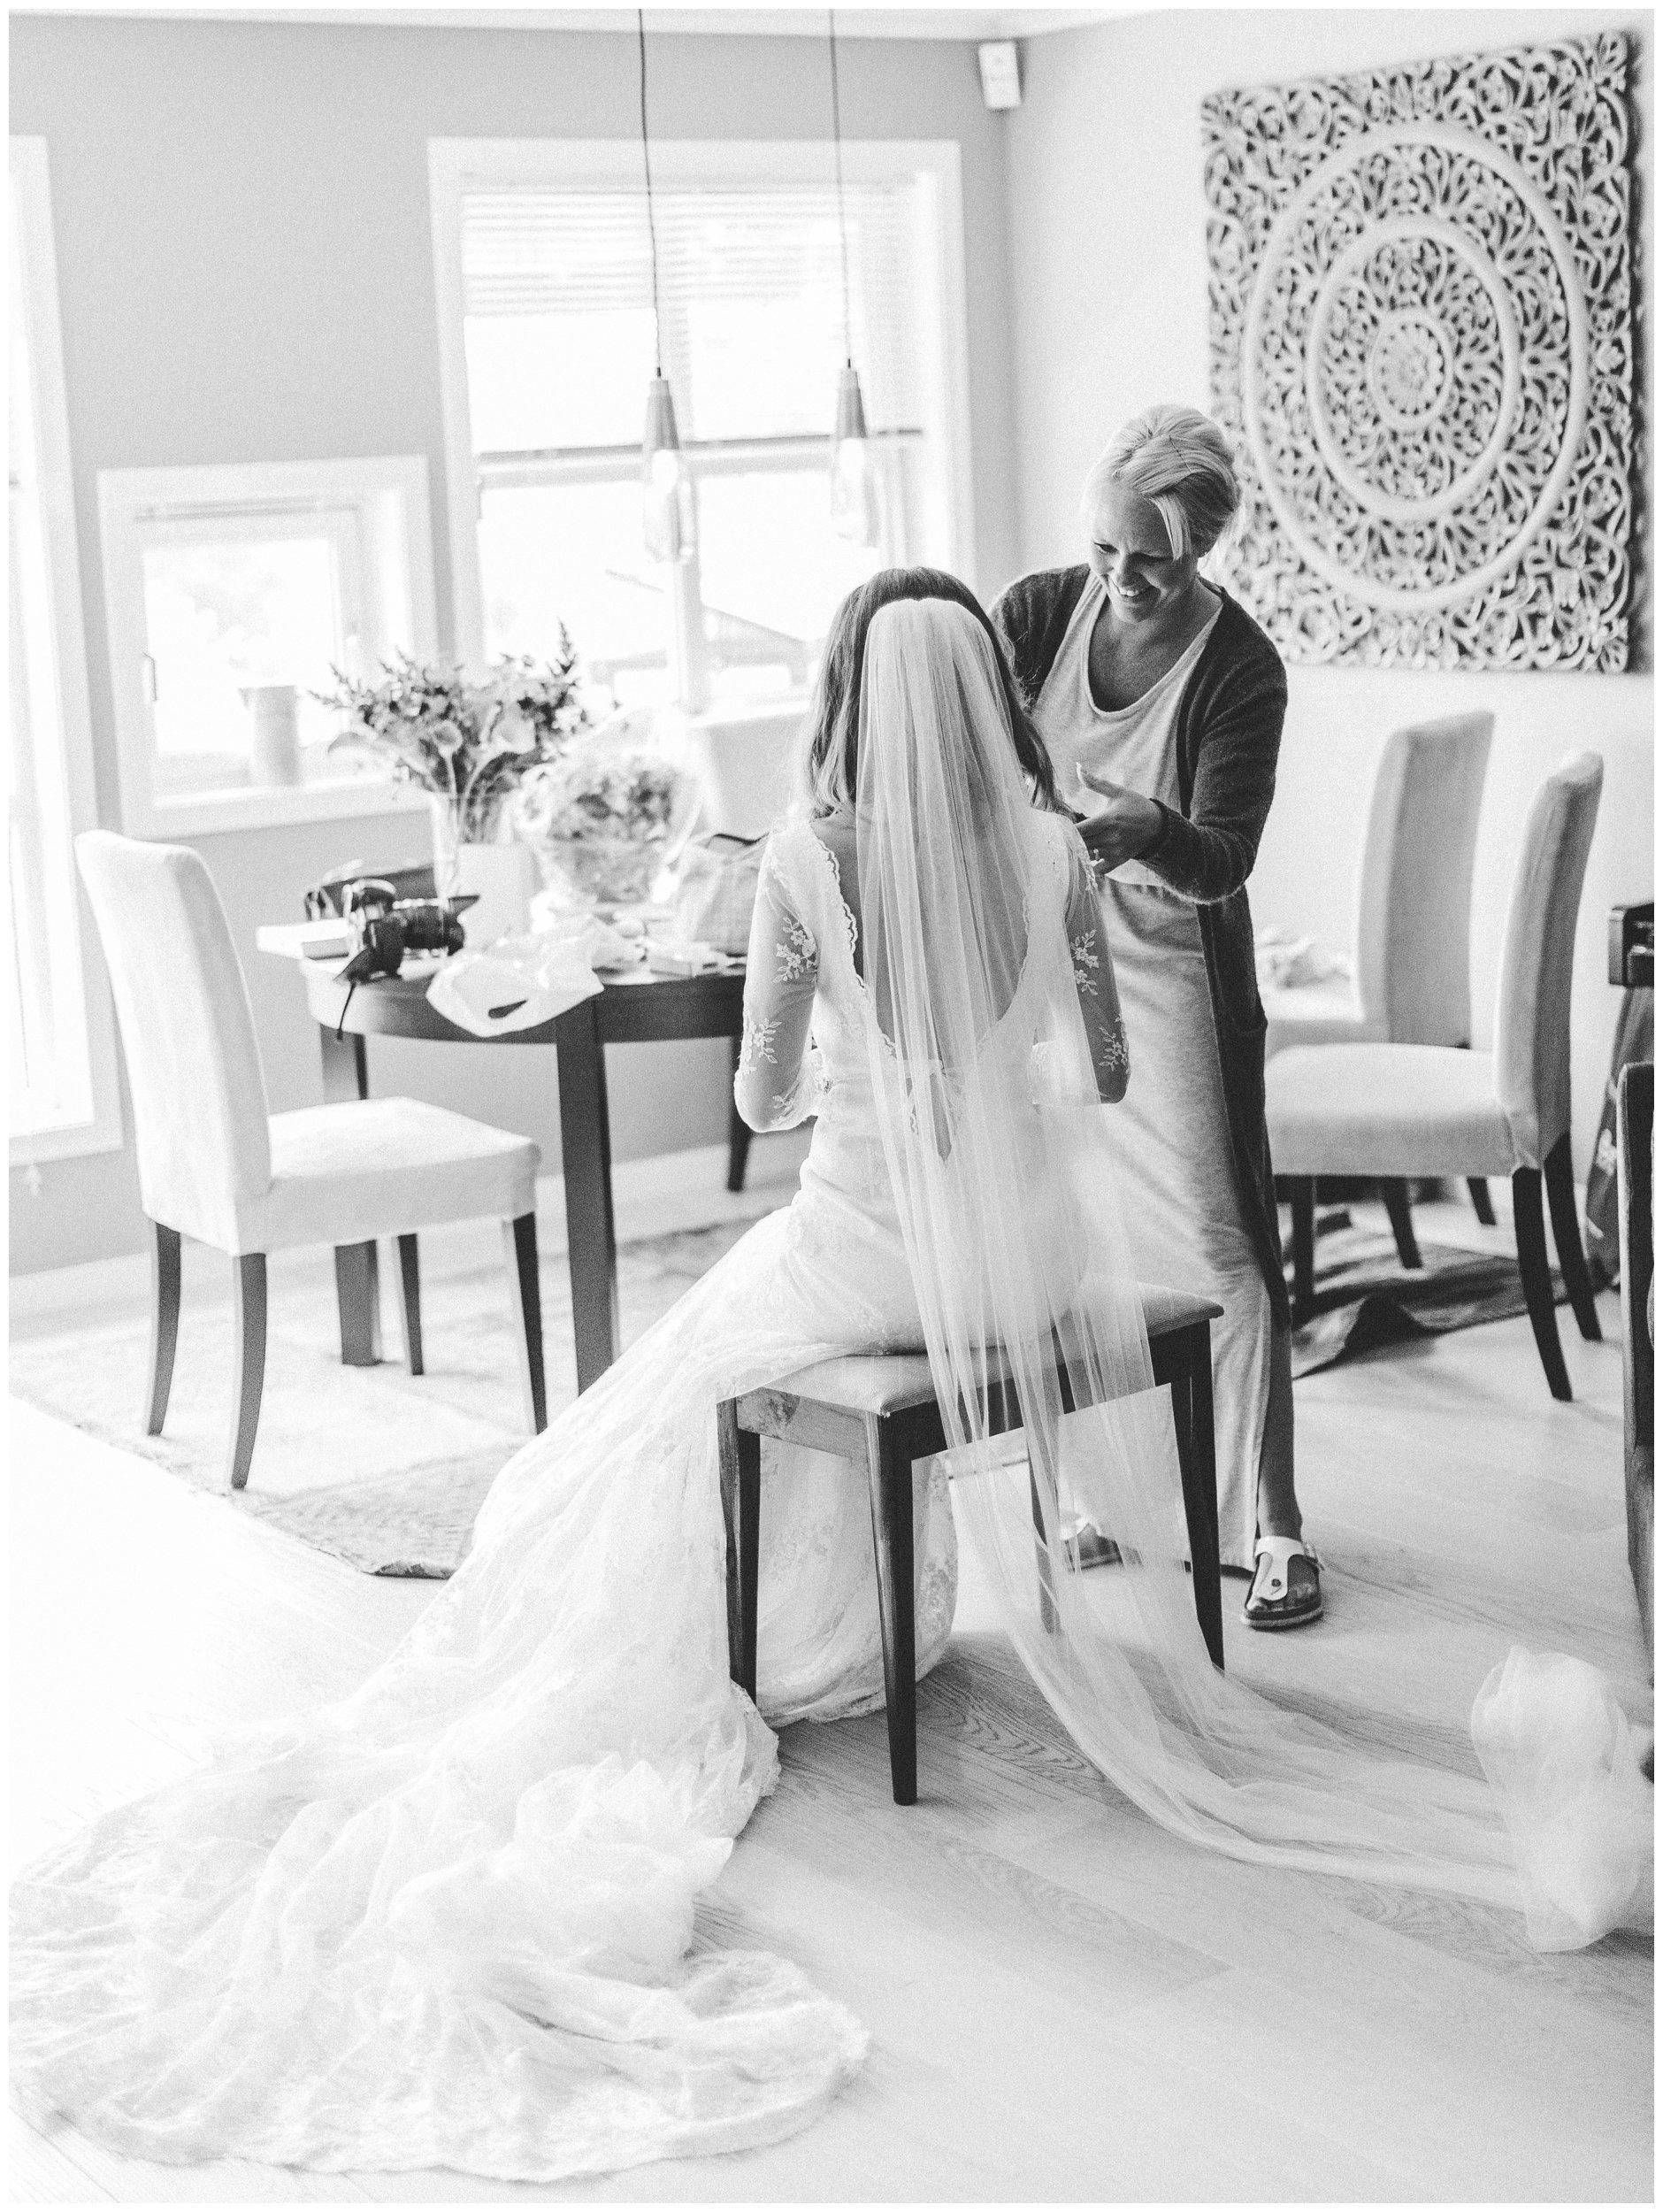 Bryllupsforberedelser med bruden og hennes slør